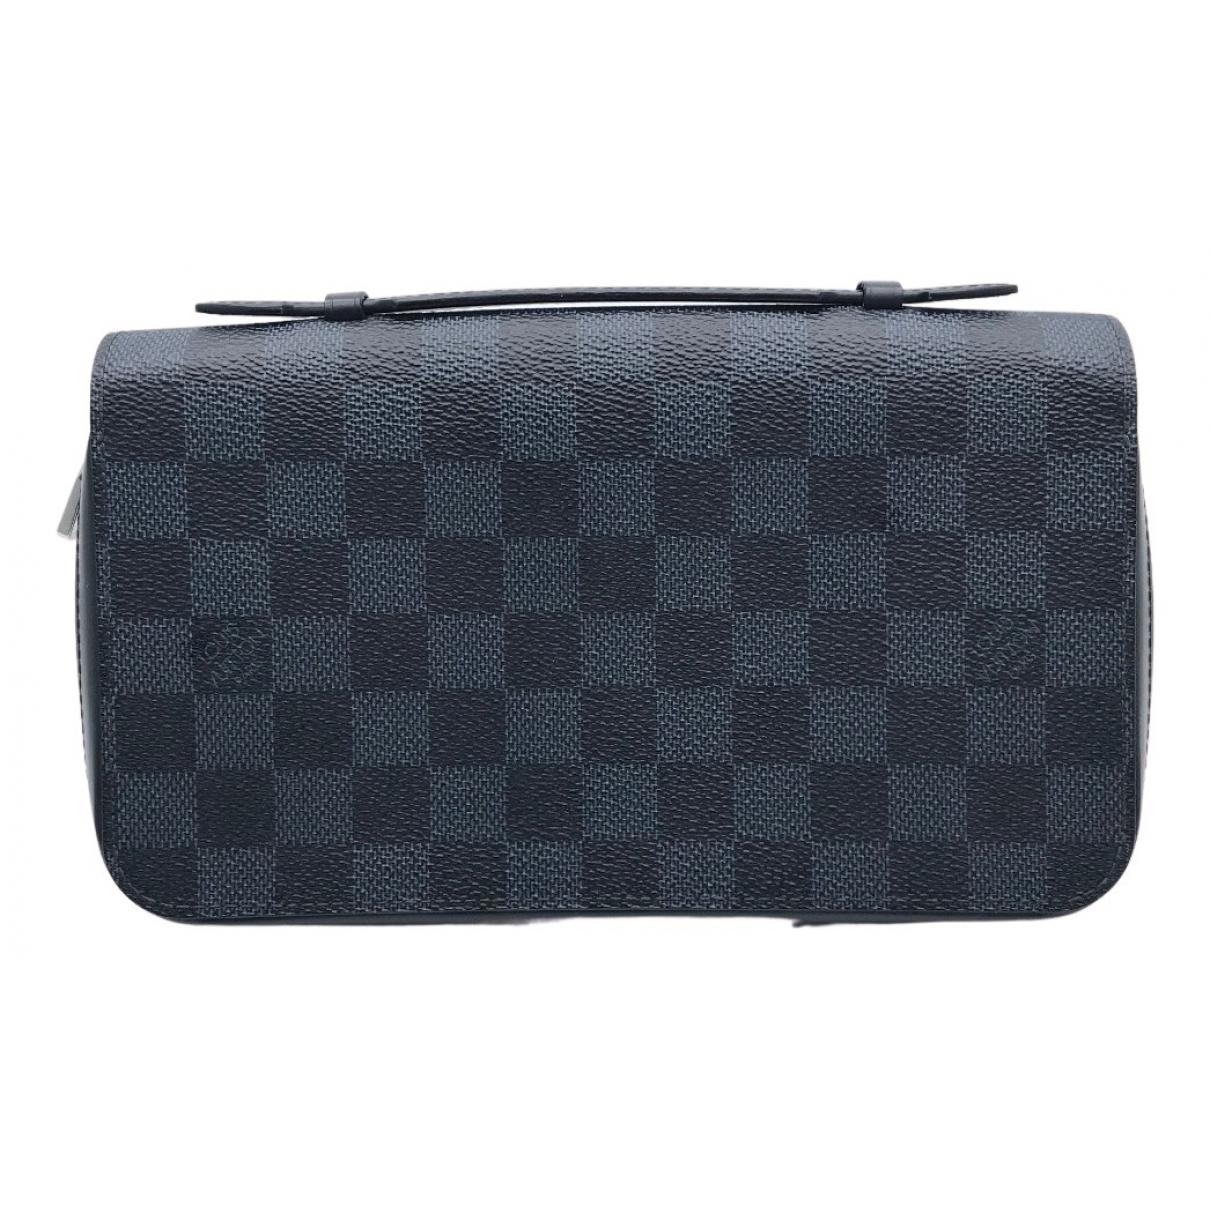 Louis Vuitton Zippy XL Black Cloth Small bag, wallet & cases for Men N